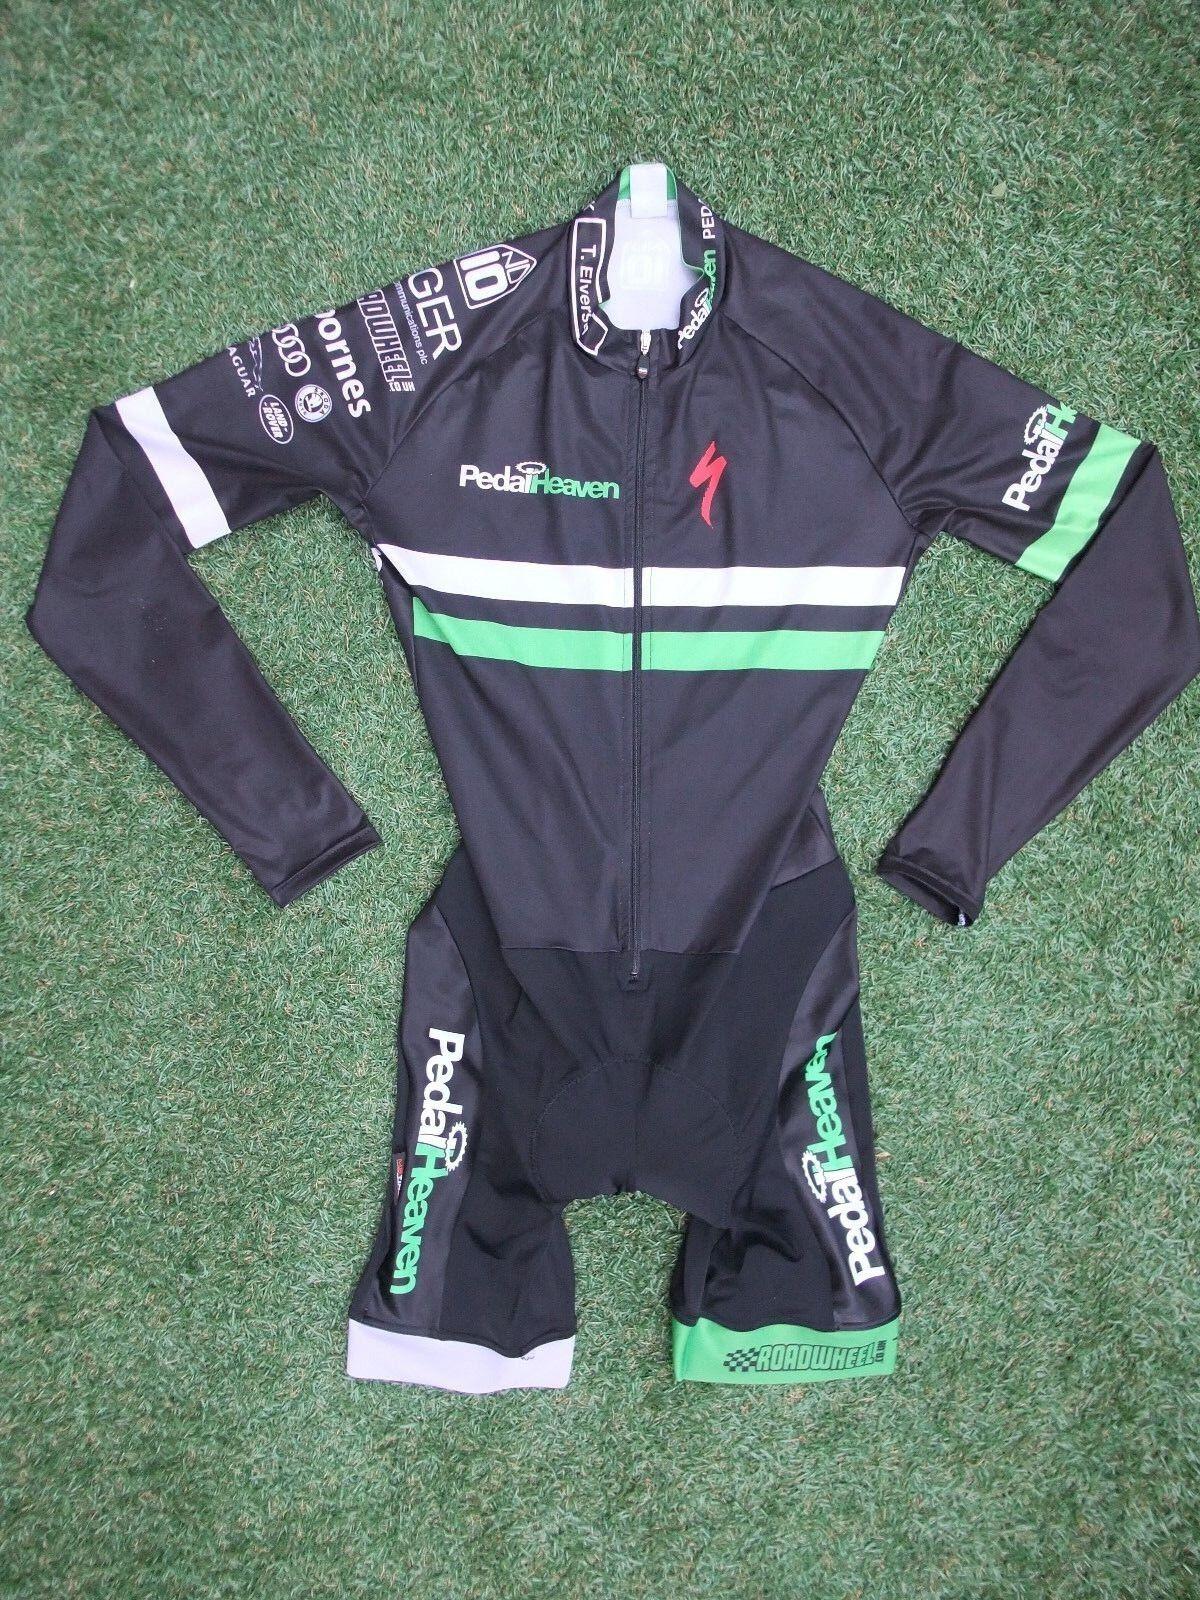 Pedal CX Heaven Team Issue Cycling TT CX Pedal Triathlon Duathlon LS Skin Suit  Medium 91246f